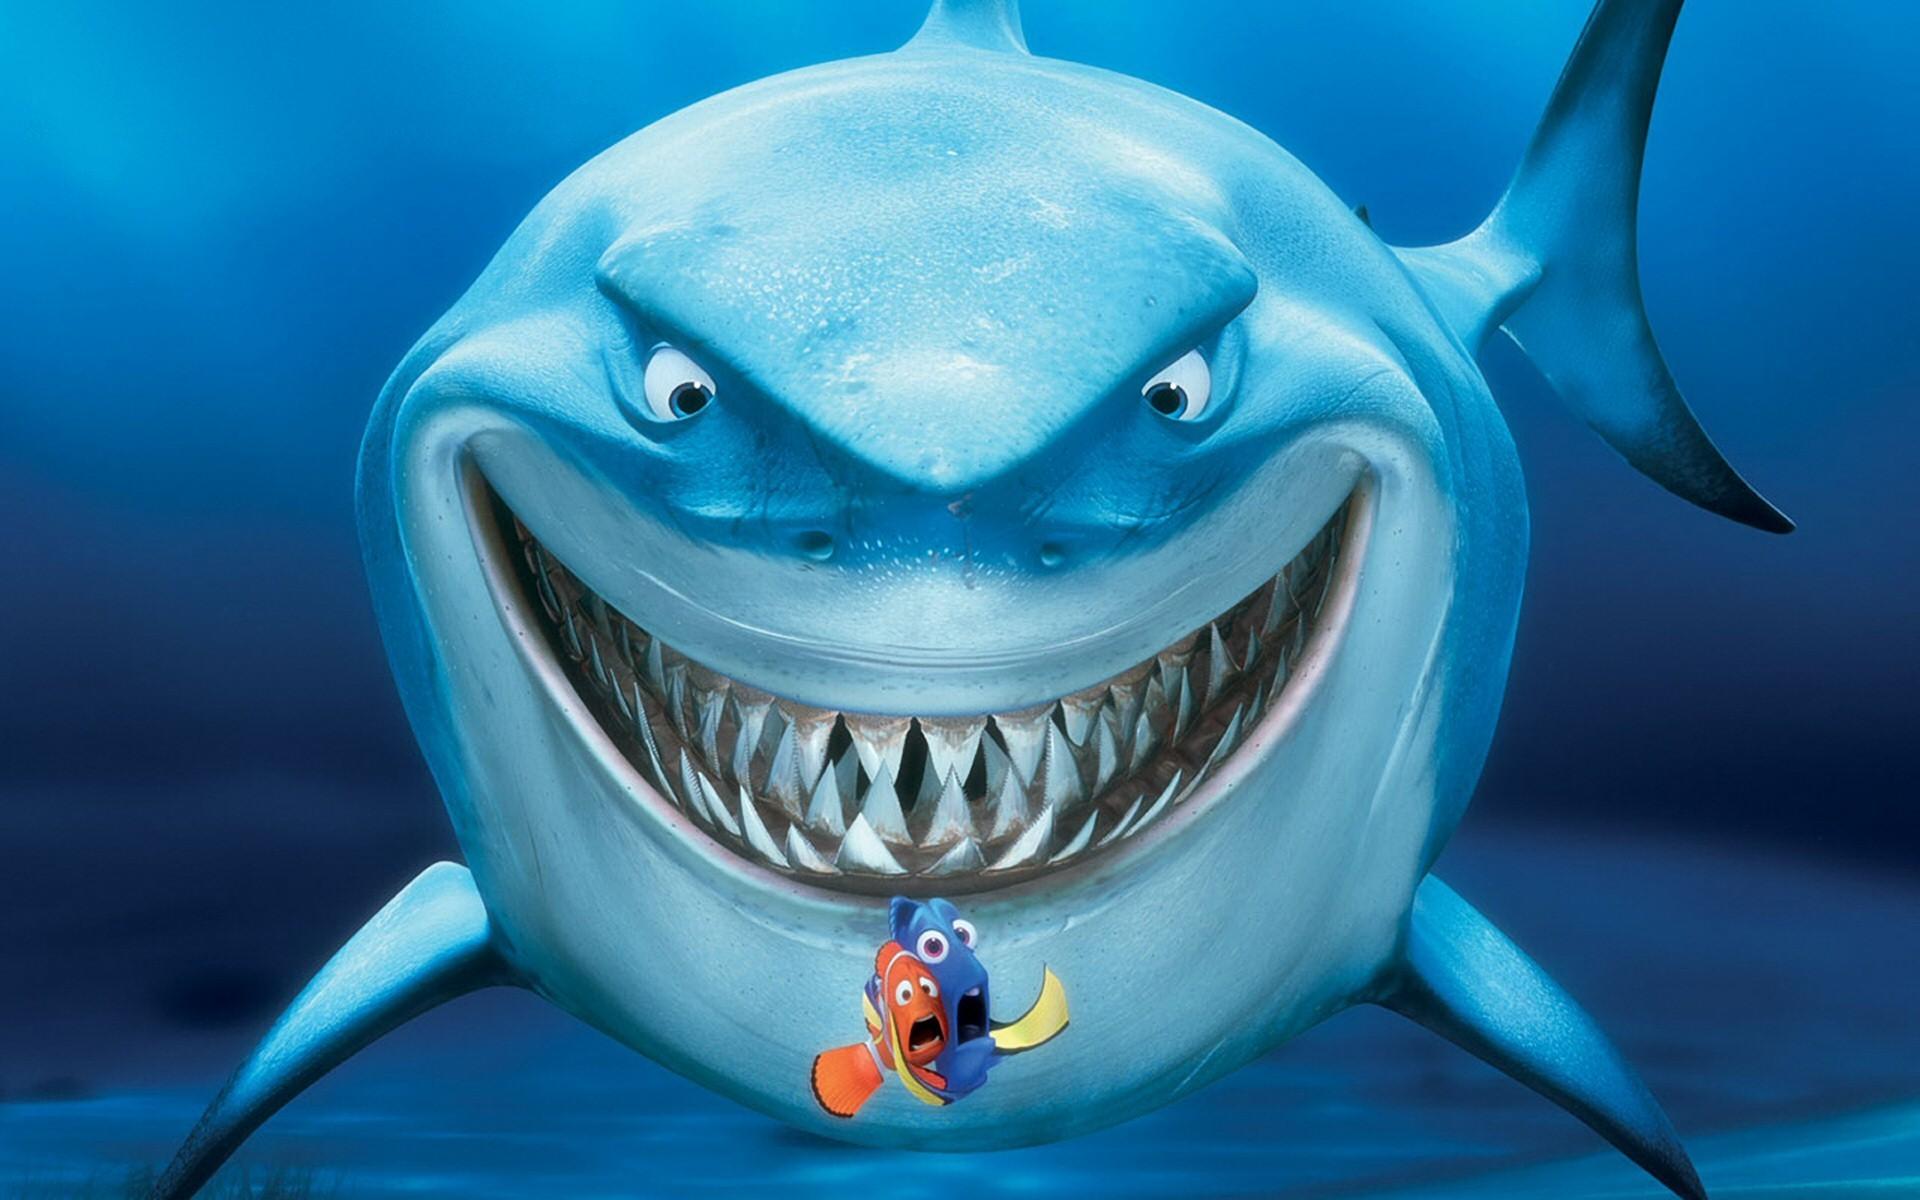 Finding Nemo Wallpaper finding nemo shark hd widescreen 1920x1200